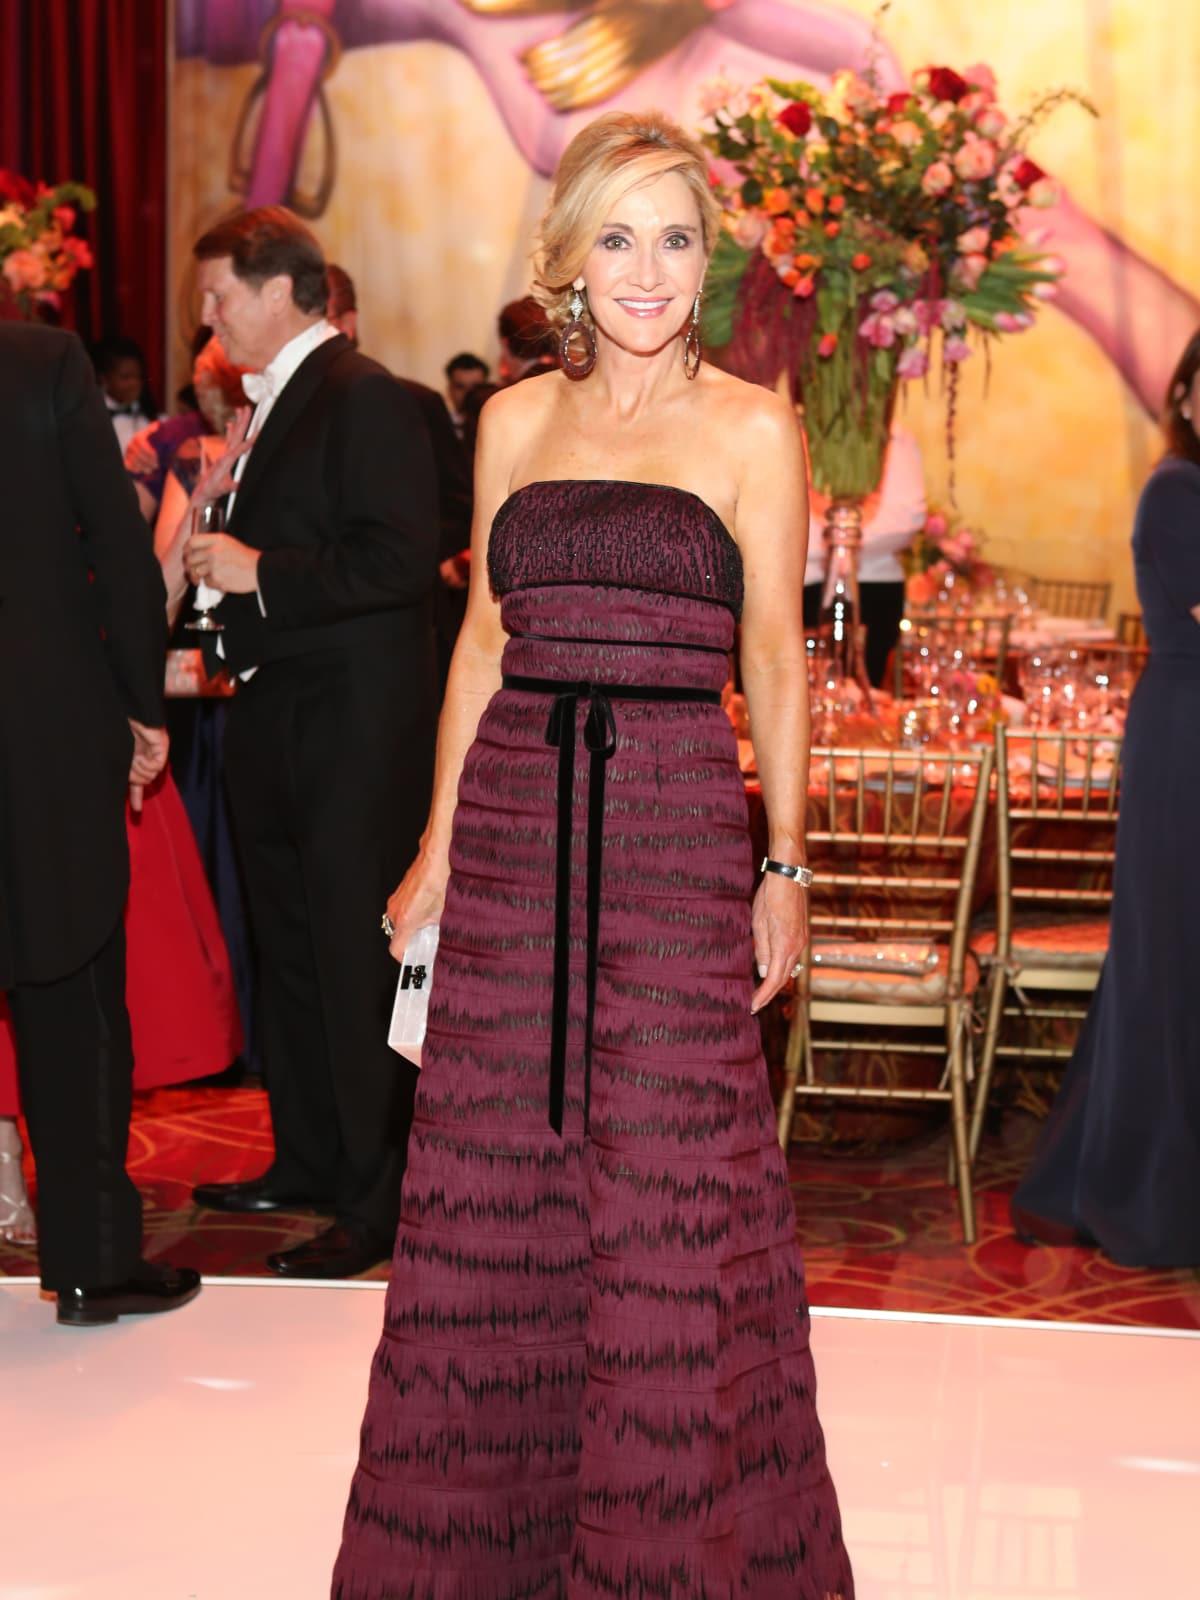 Houston, Opera Ball Gowns, April 2016, Jana Arnoldy in Oscar De La Renta.